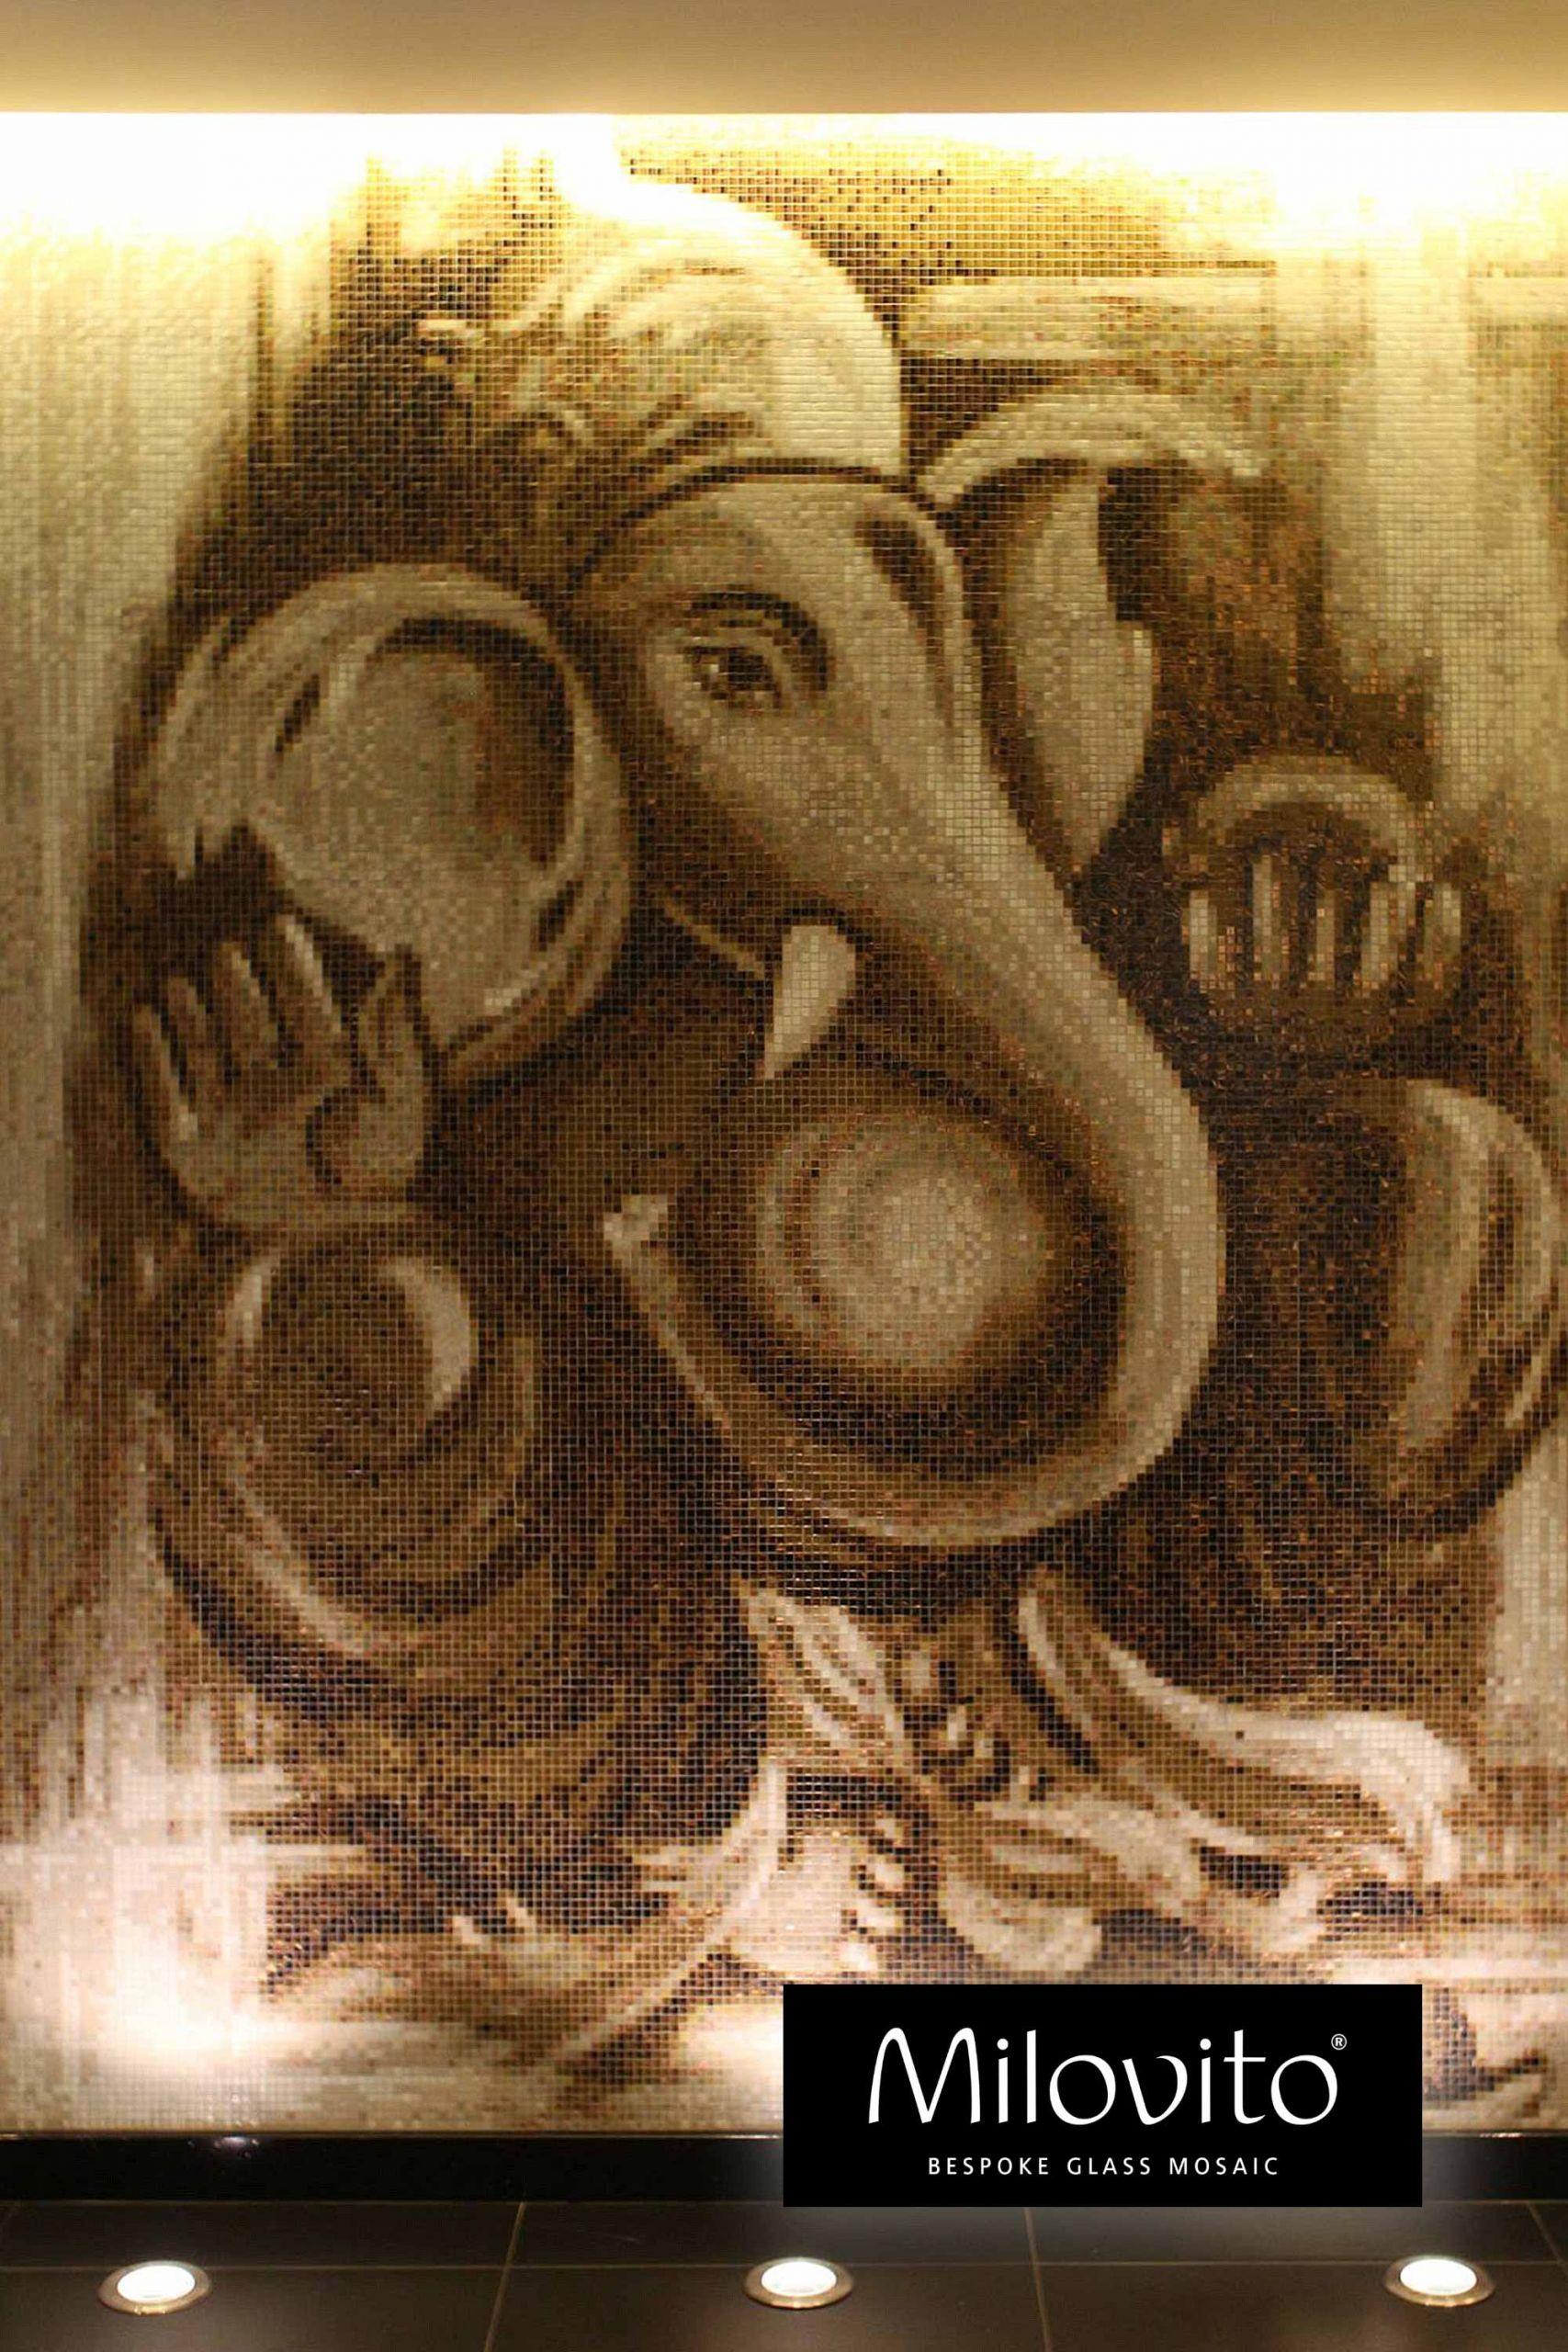 #mozaiek #Ganesha #restaurant | Portugal | thuisdecoratie | interieurdesign | tegels | olifant | bespoke | maatwerk | glasmozaïek | fotomozaïek | reizen | verhuizen | ontwerp | design | Hindoeïsme | interiordesign | homeinspiration | interiorlovers | homeinspiration